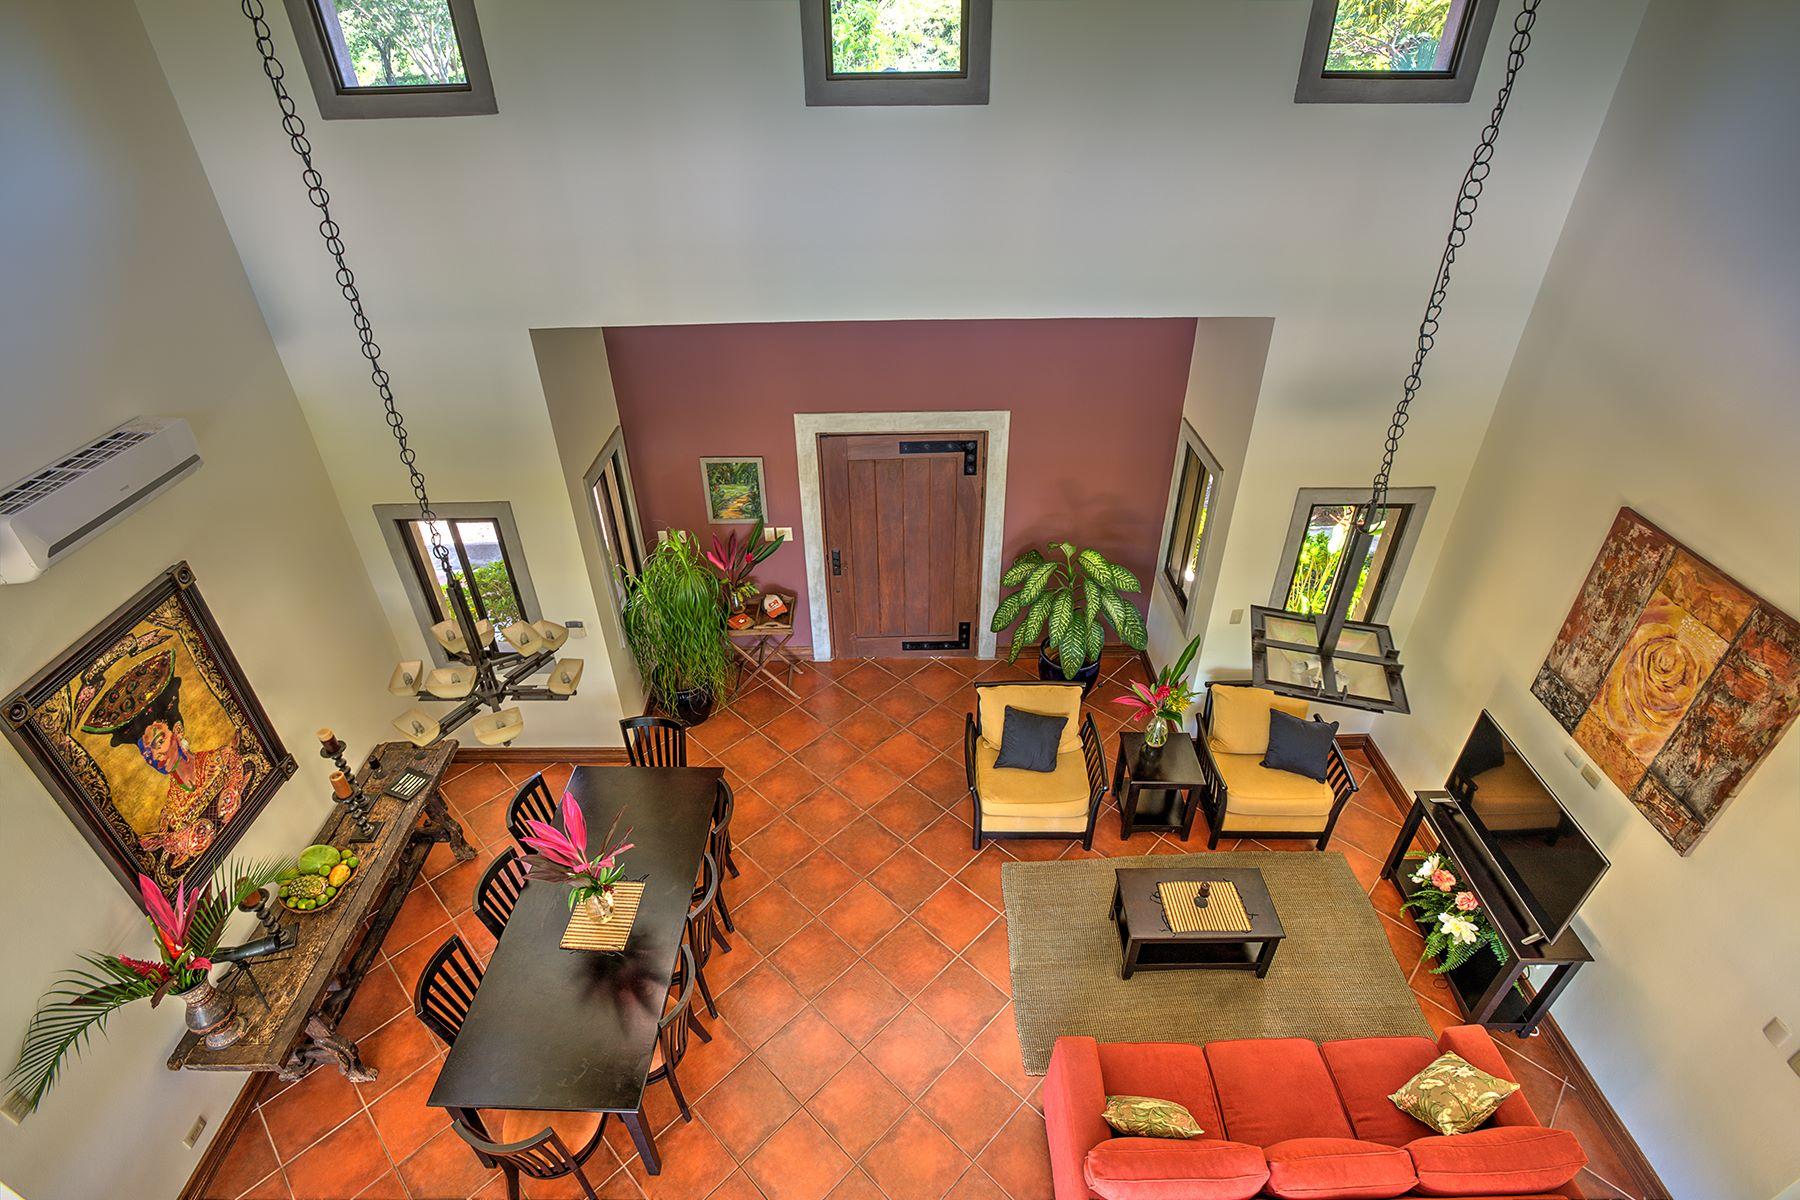 Additional photo for property listing at Villa Fin Luna PRICE REDUCED Reserva Conchal, Guanacaste Costa Rica